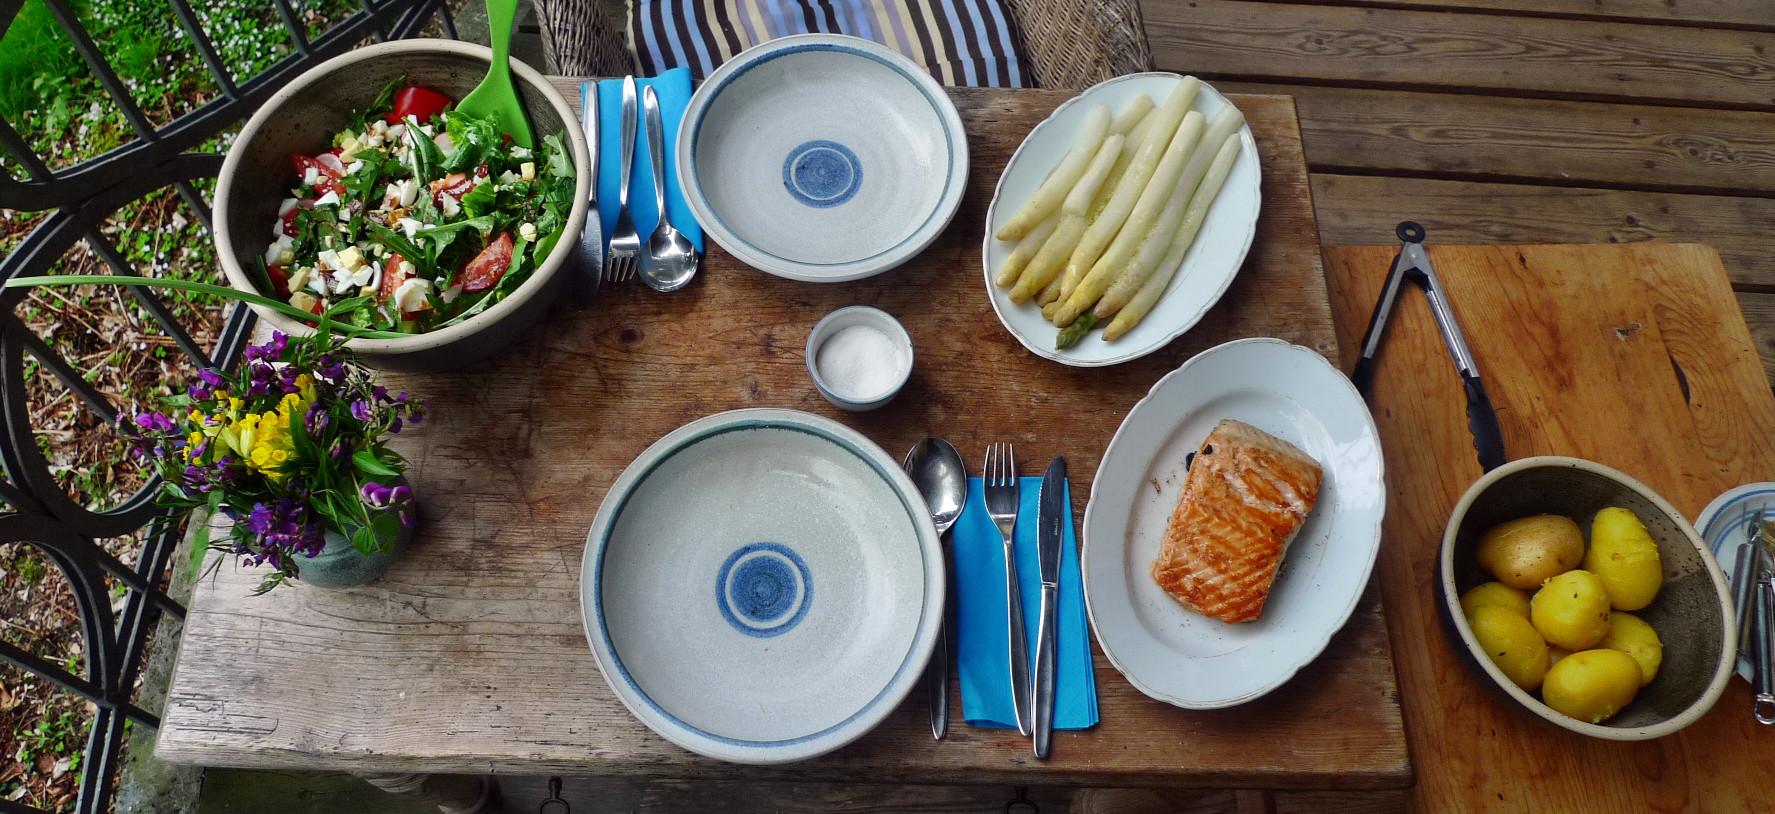 Lachs,Spargel,Salat,Kartoffeln - 25.4.15   (8)